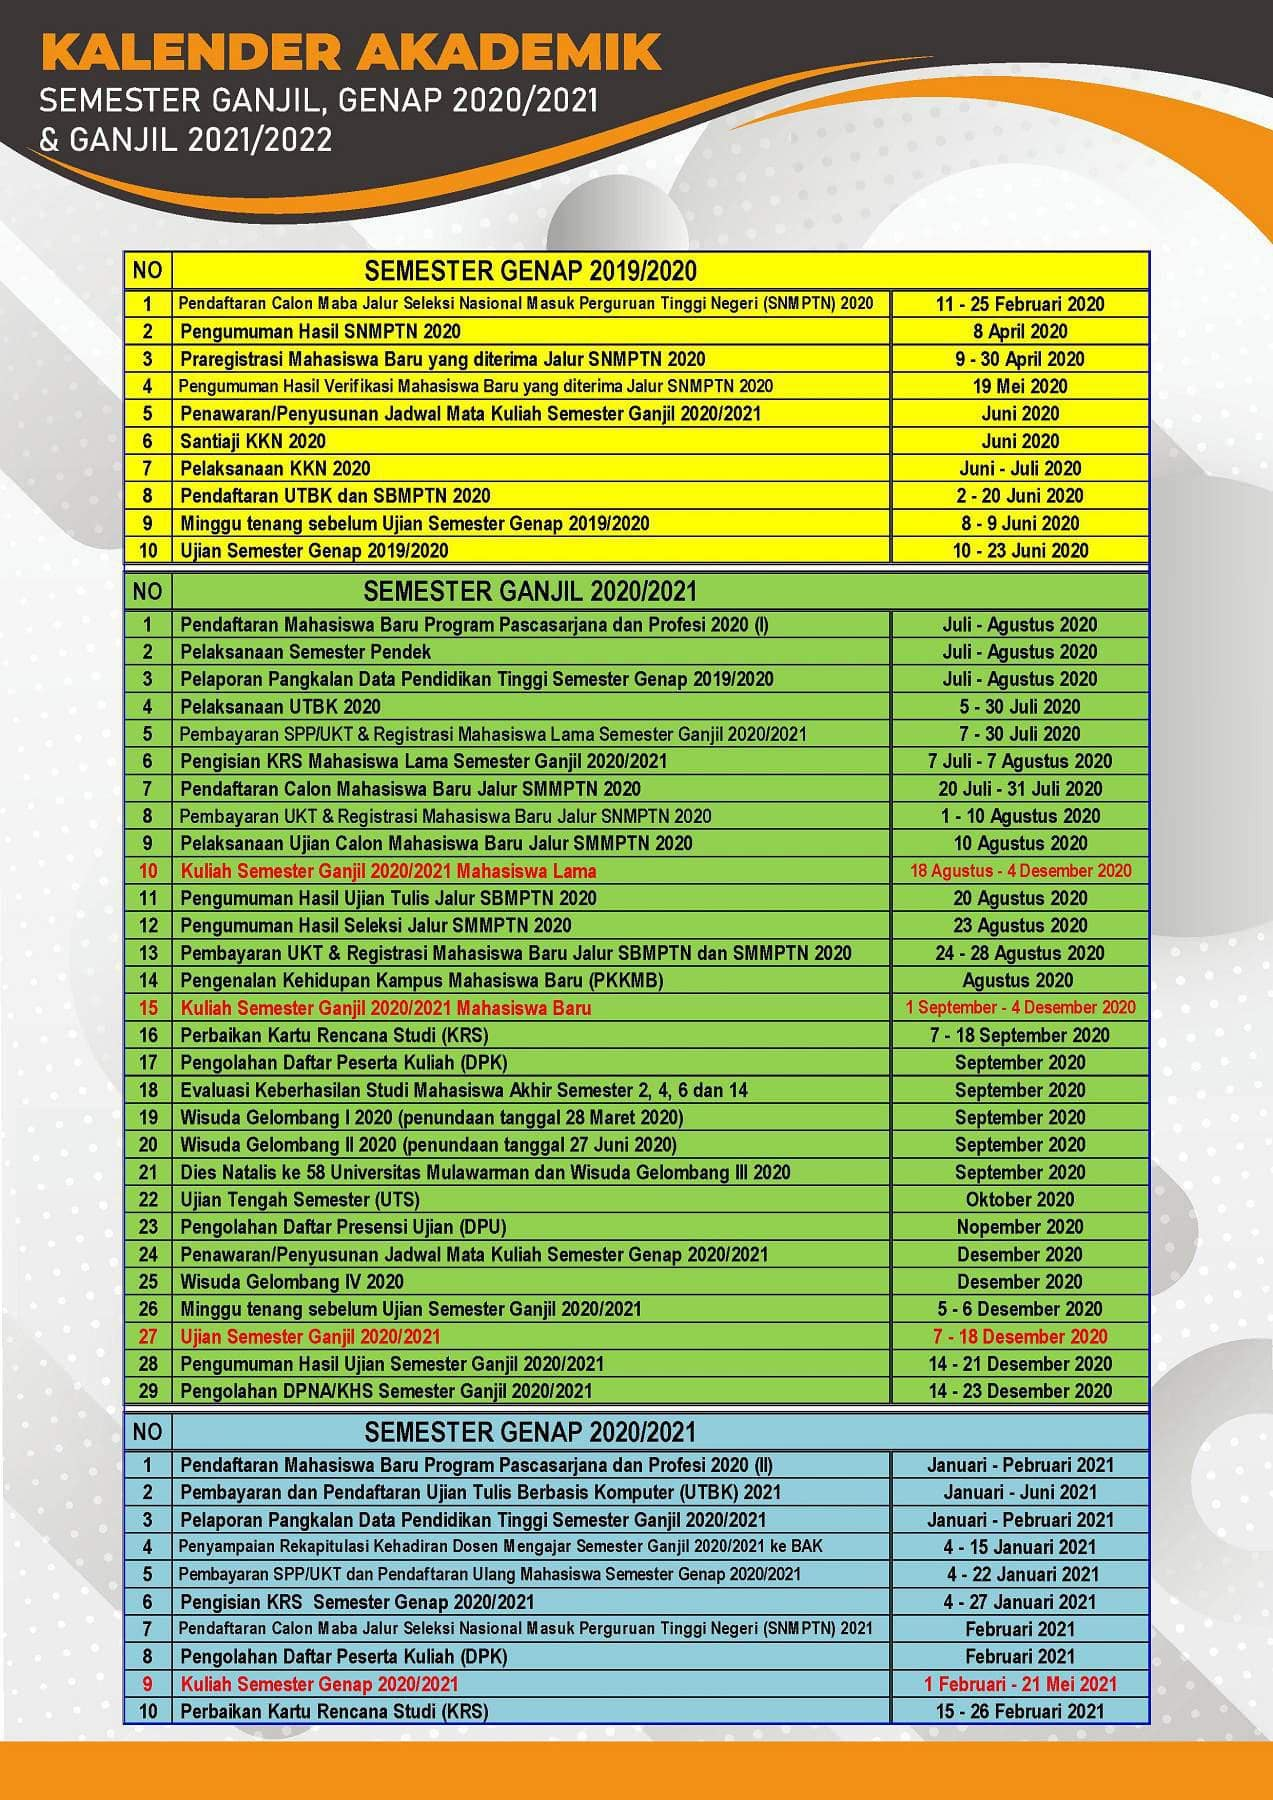 Kalender Akademik - ILMU PEMERINTAHAN